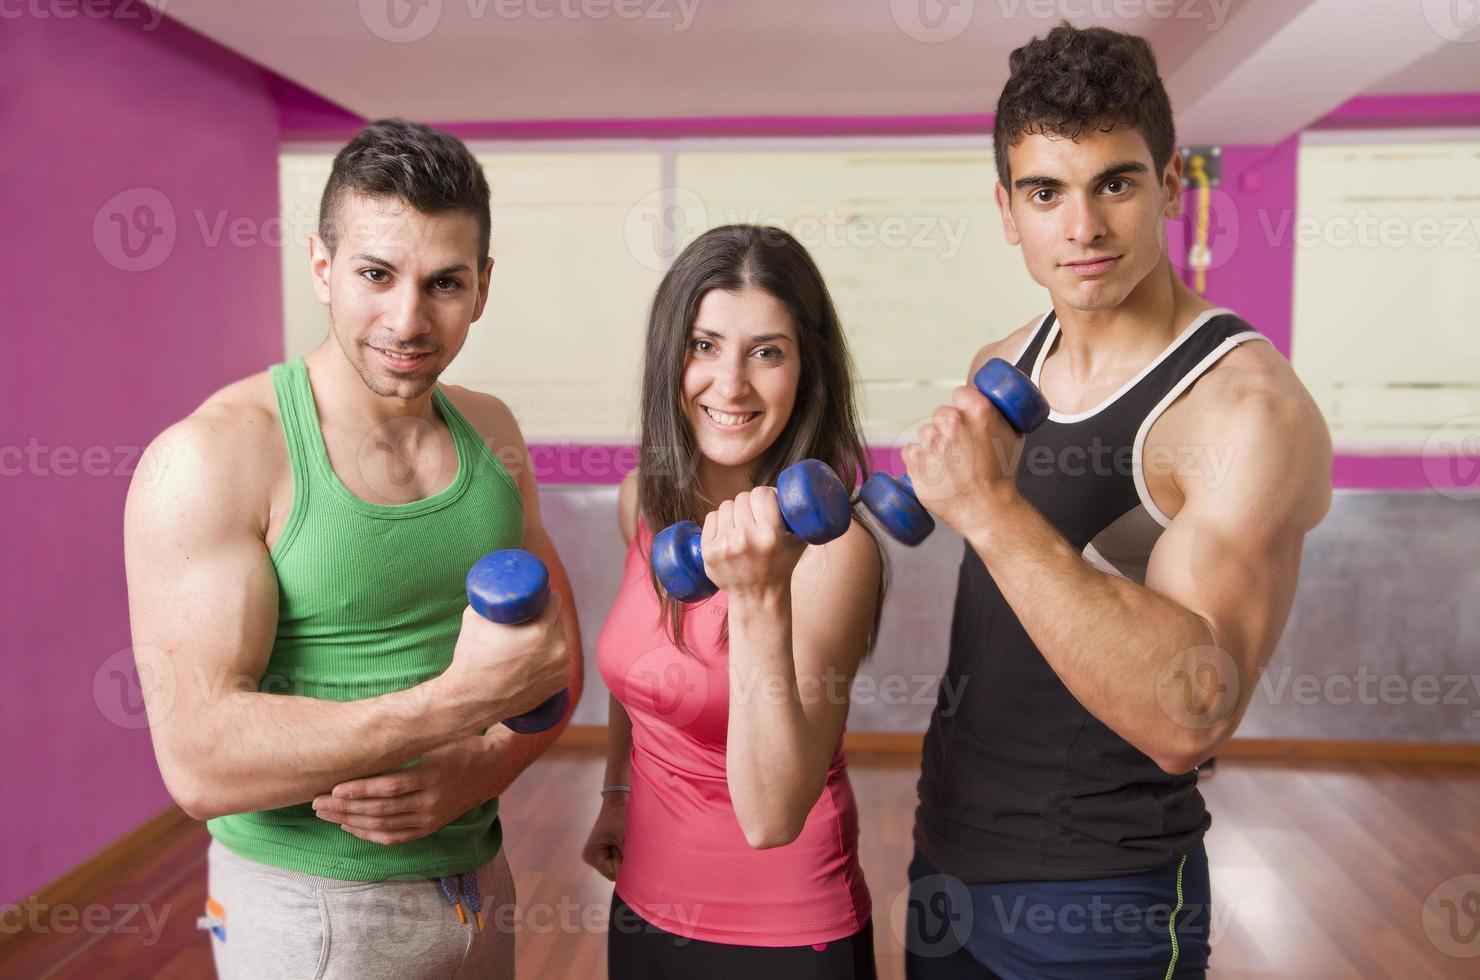 Fitness-Studio-Leute foto